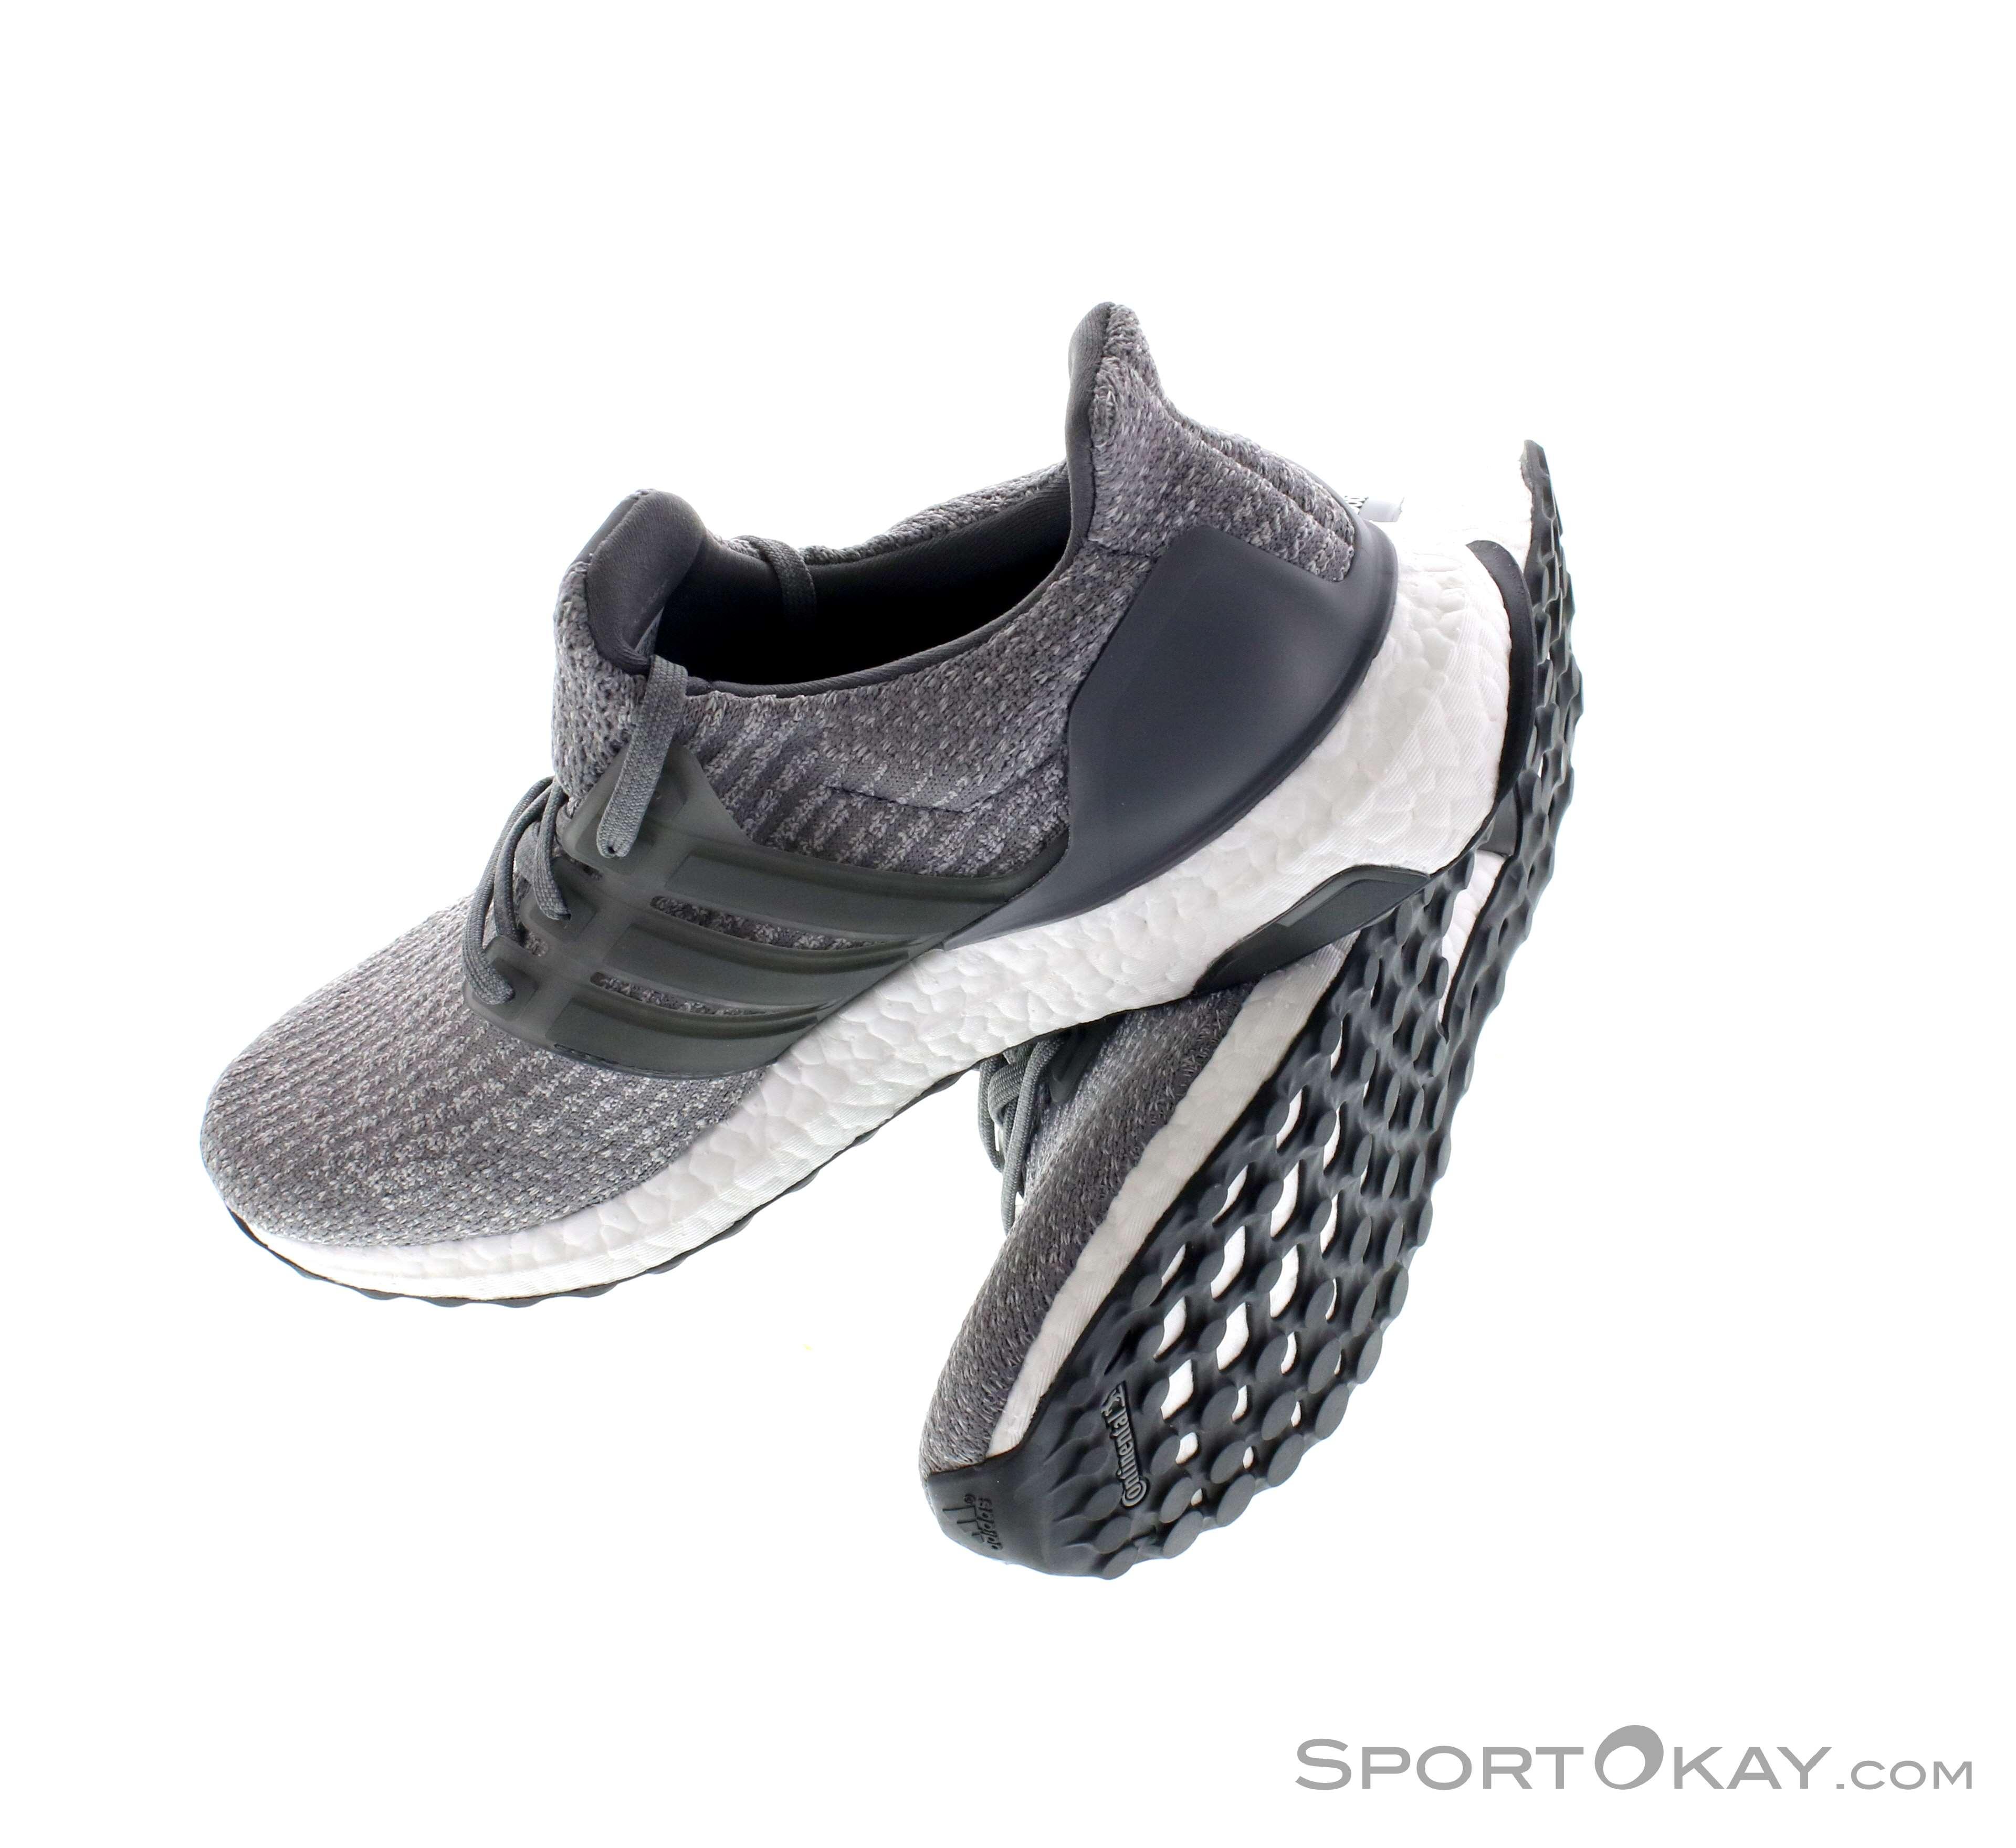 b64c621811b4d adidas Ultra Boost 3.0 Womens Running Shoes - Running Shoes ...